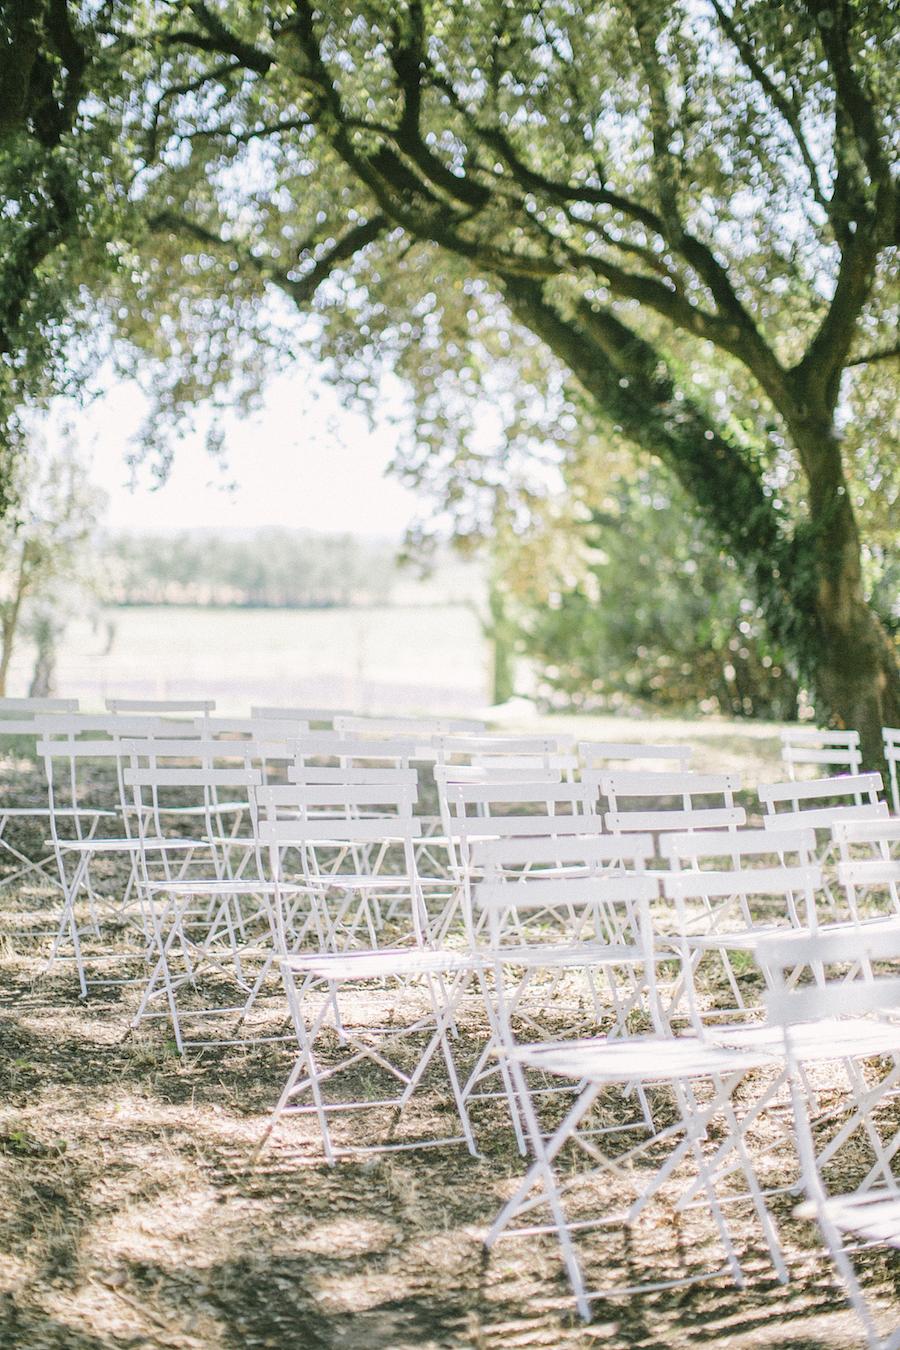 saya-photography-rustic-french-wedding-provence-domaines-de-patras-55.jpg